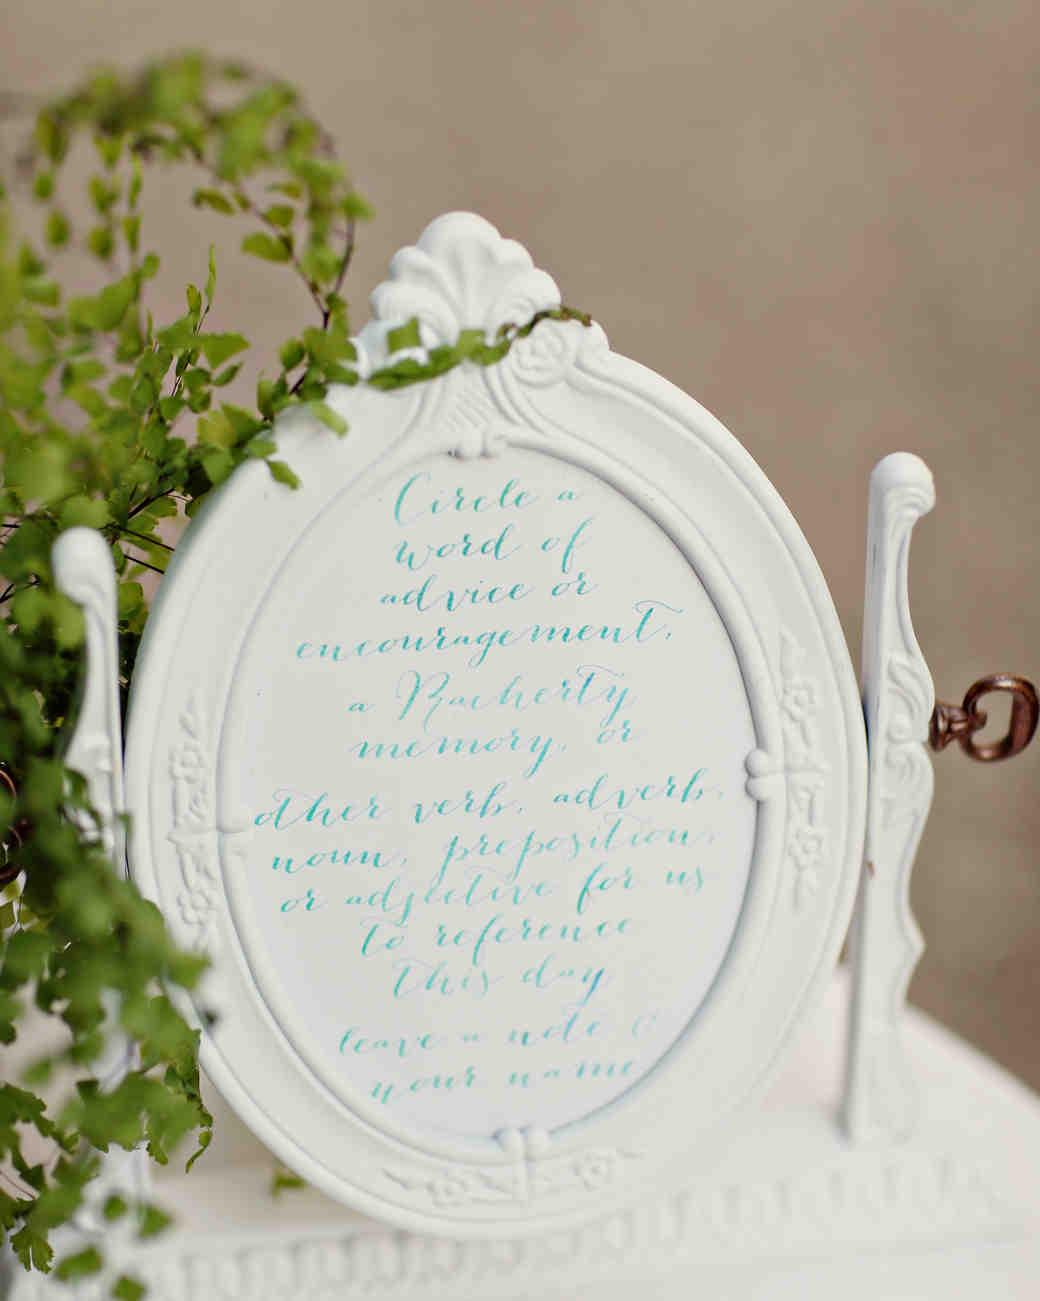 lindsay-andy-wedding-signage-4465-s111659-1114.jpg